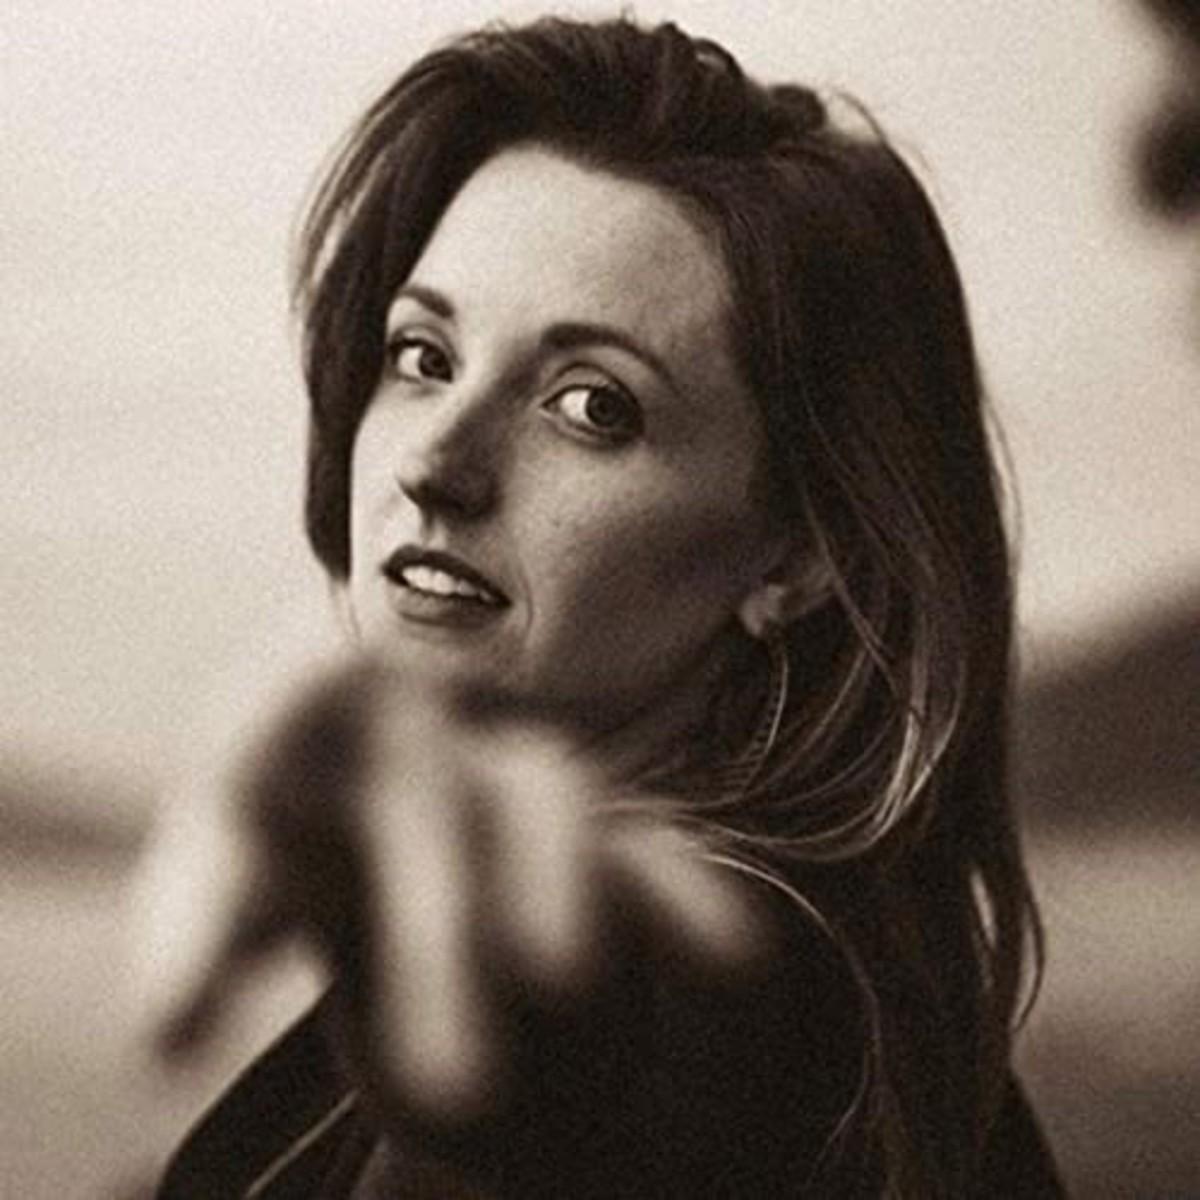 Lizzie Weber, courtesy of lizzieweber.com